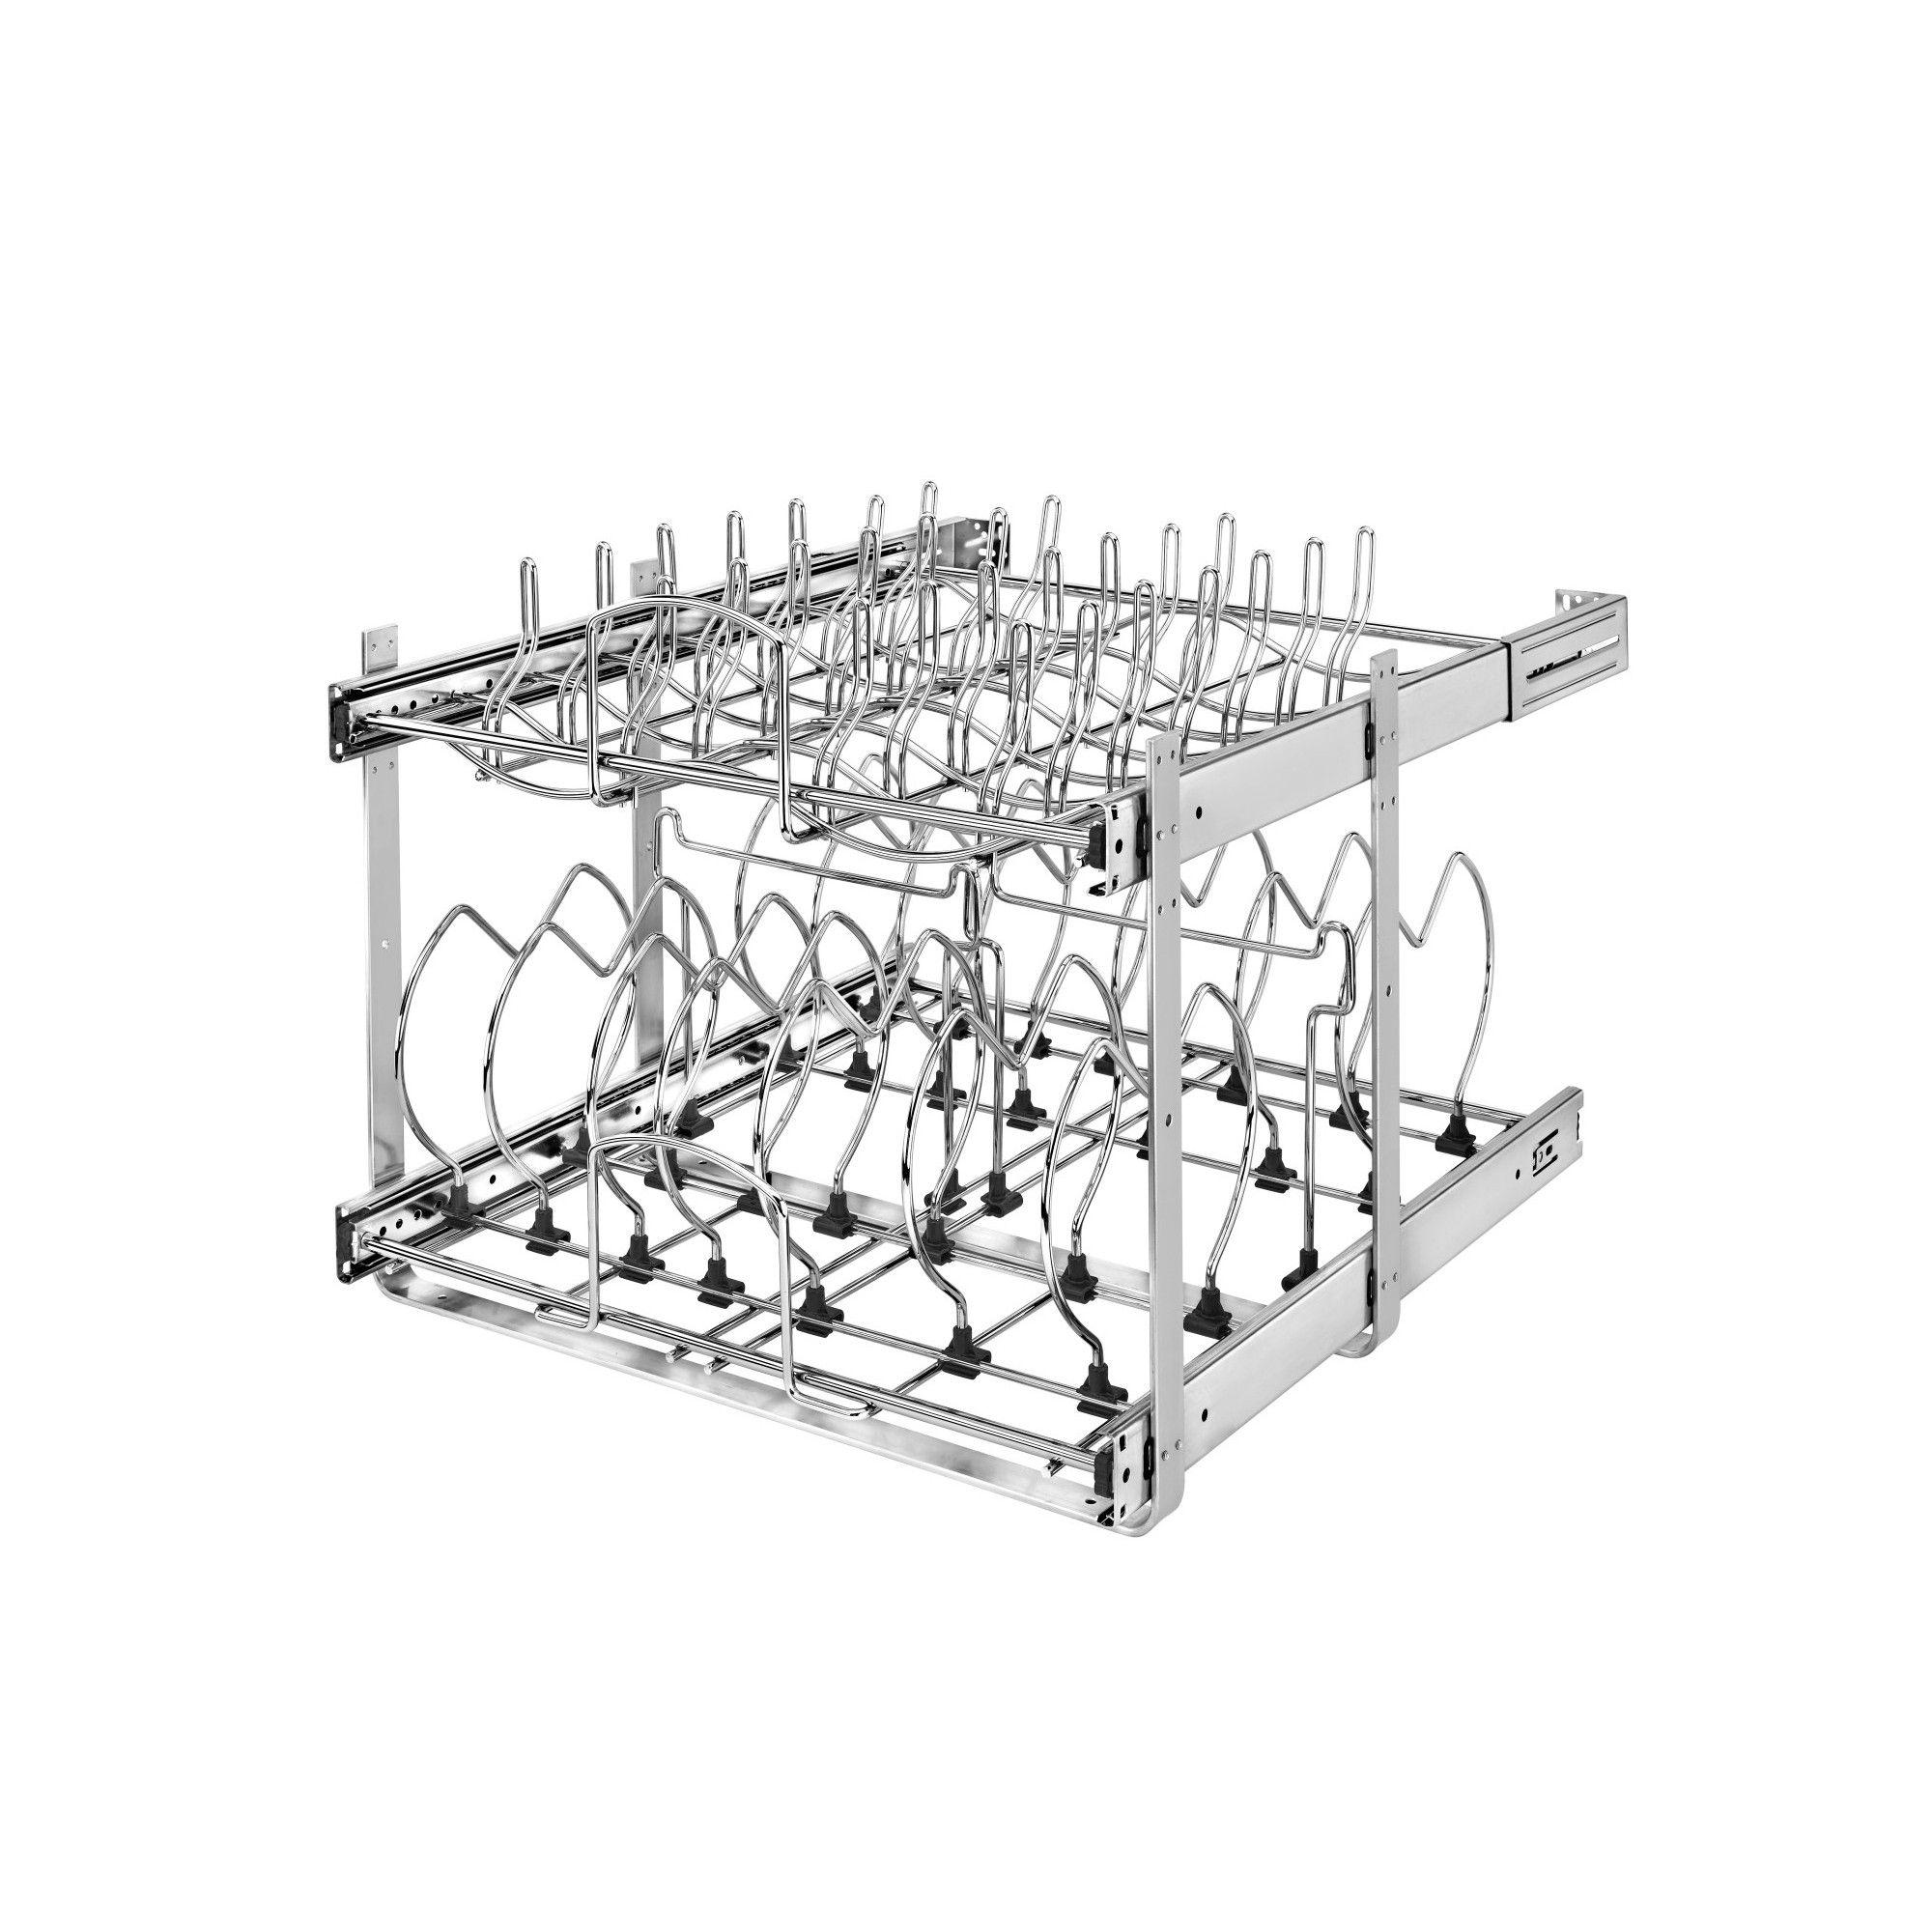 Rev A Shelf 5cw2 Series 21 Inch 2 Tier Wire Organizer For Cookware